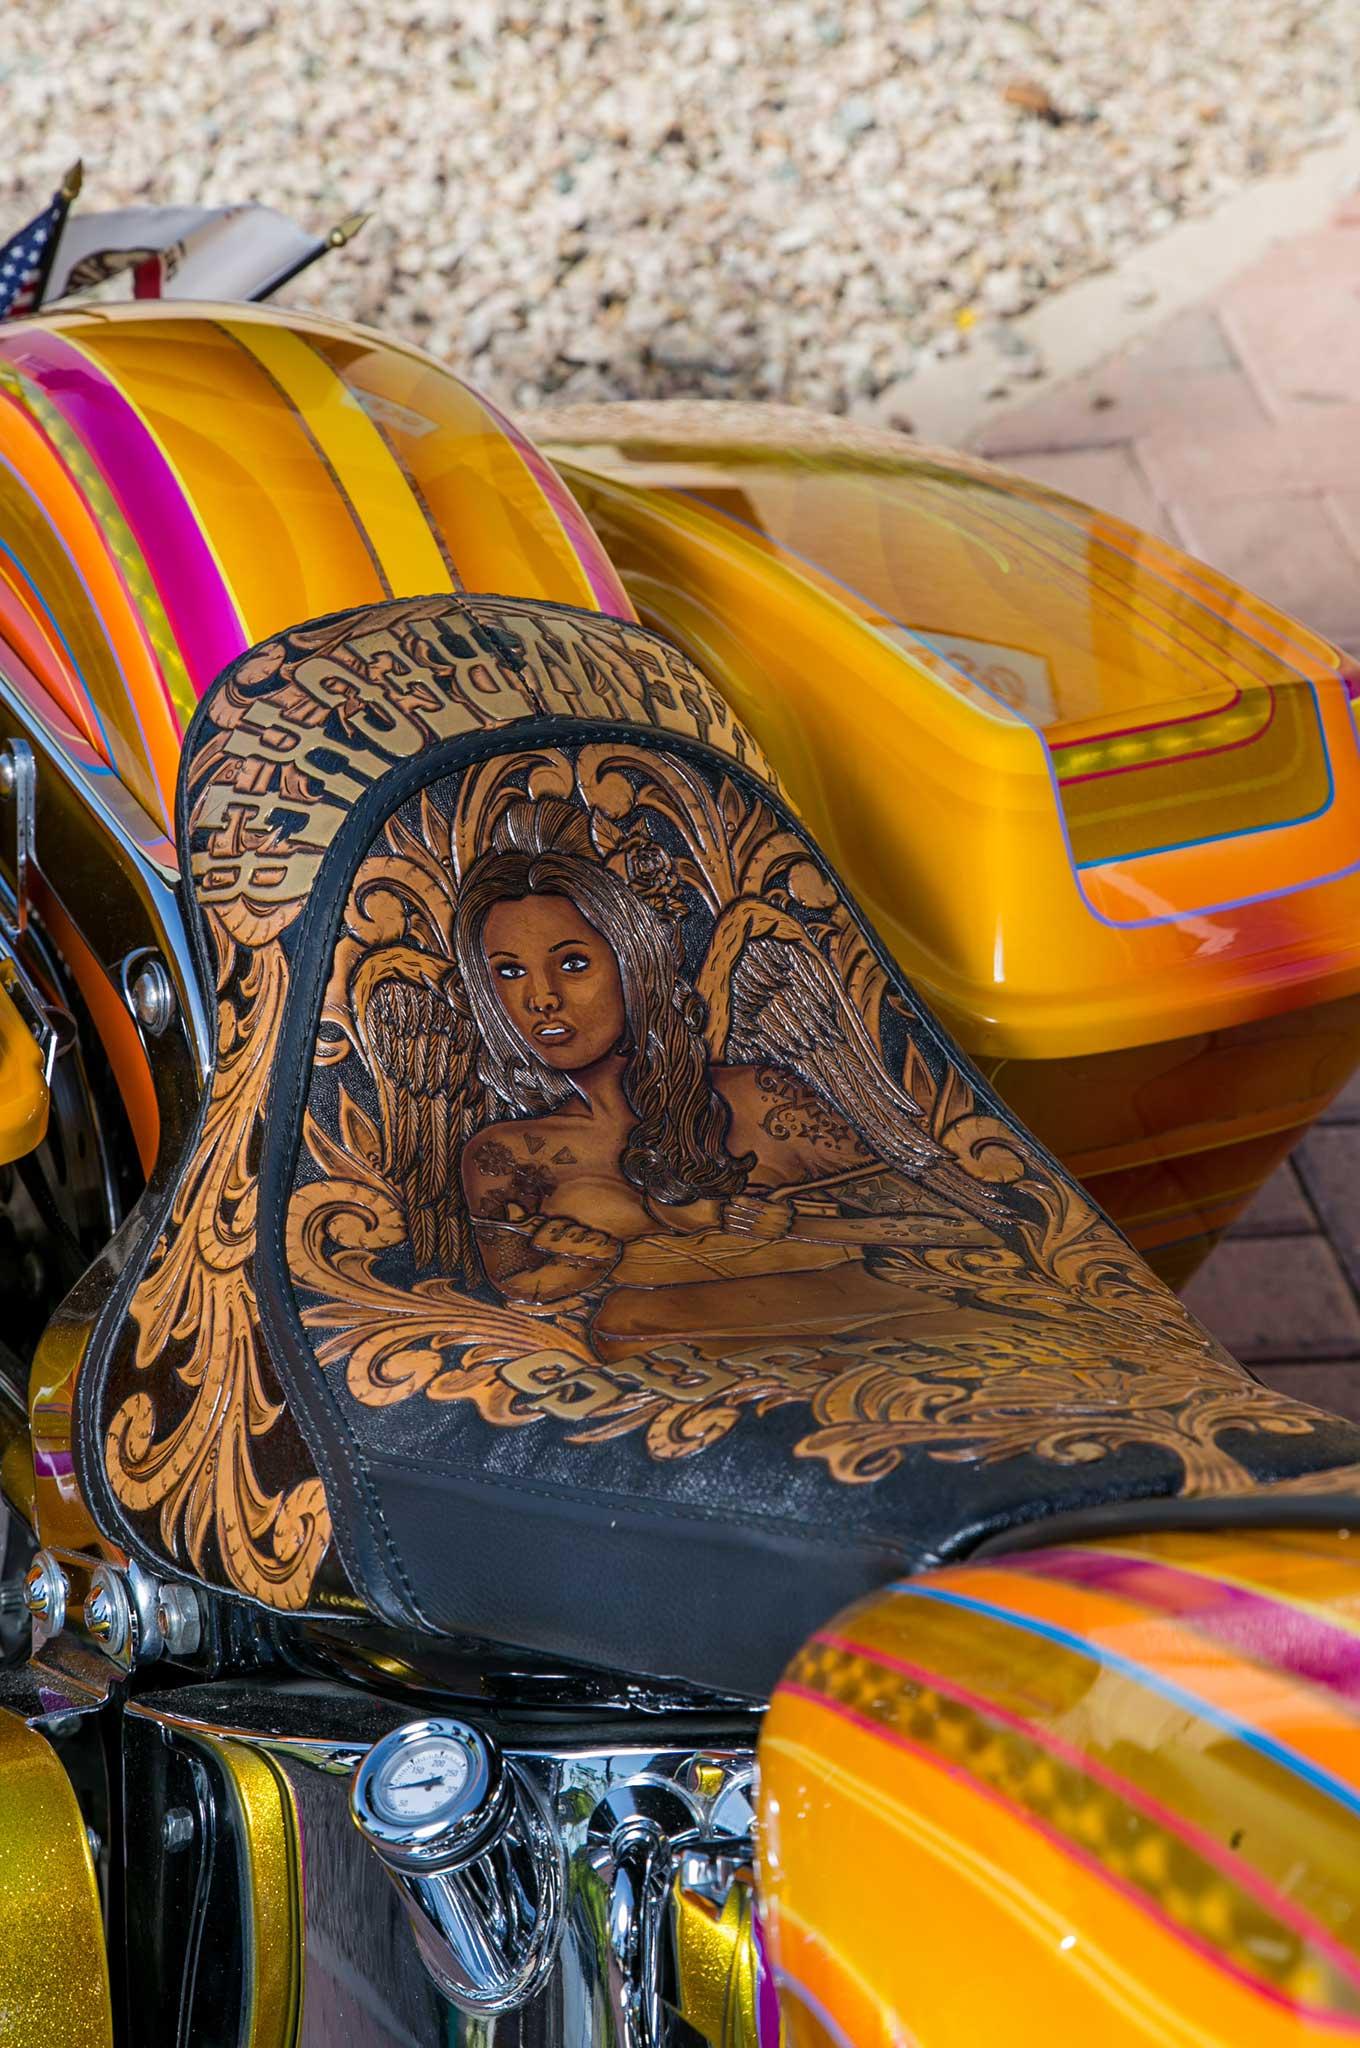 2004 Harley Davidson Fat Boy Endless Possibilities